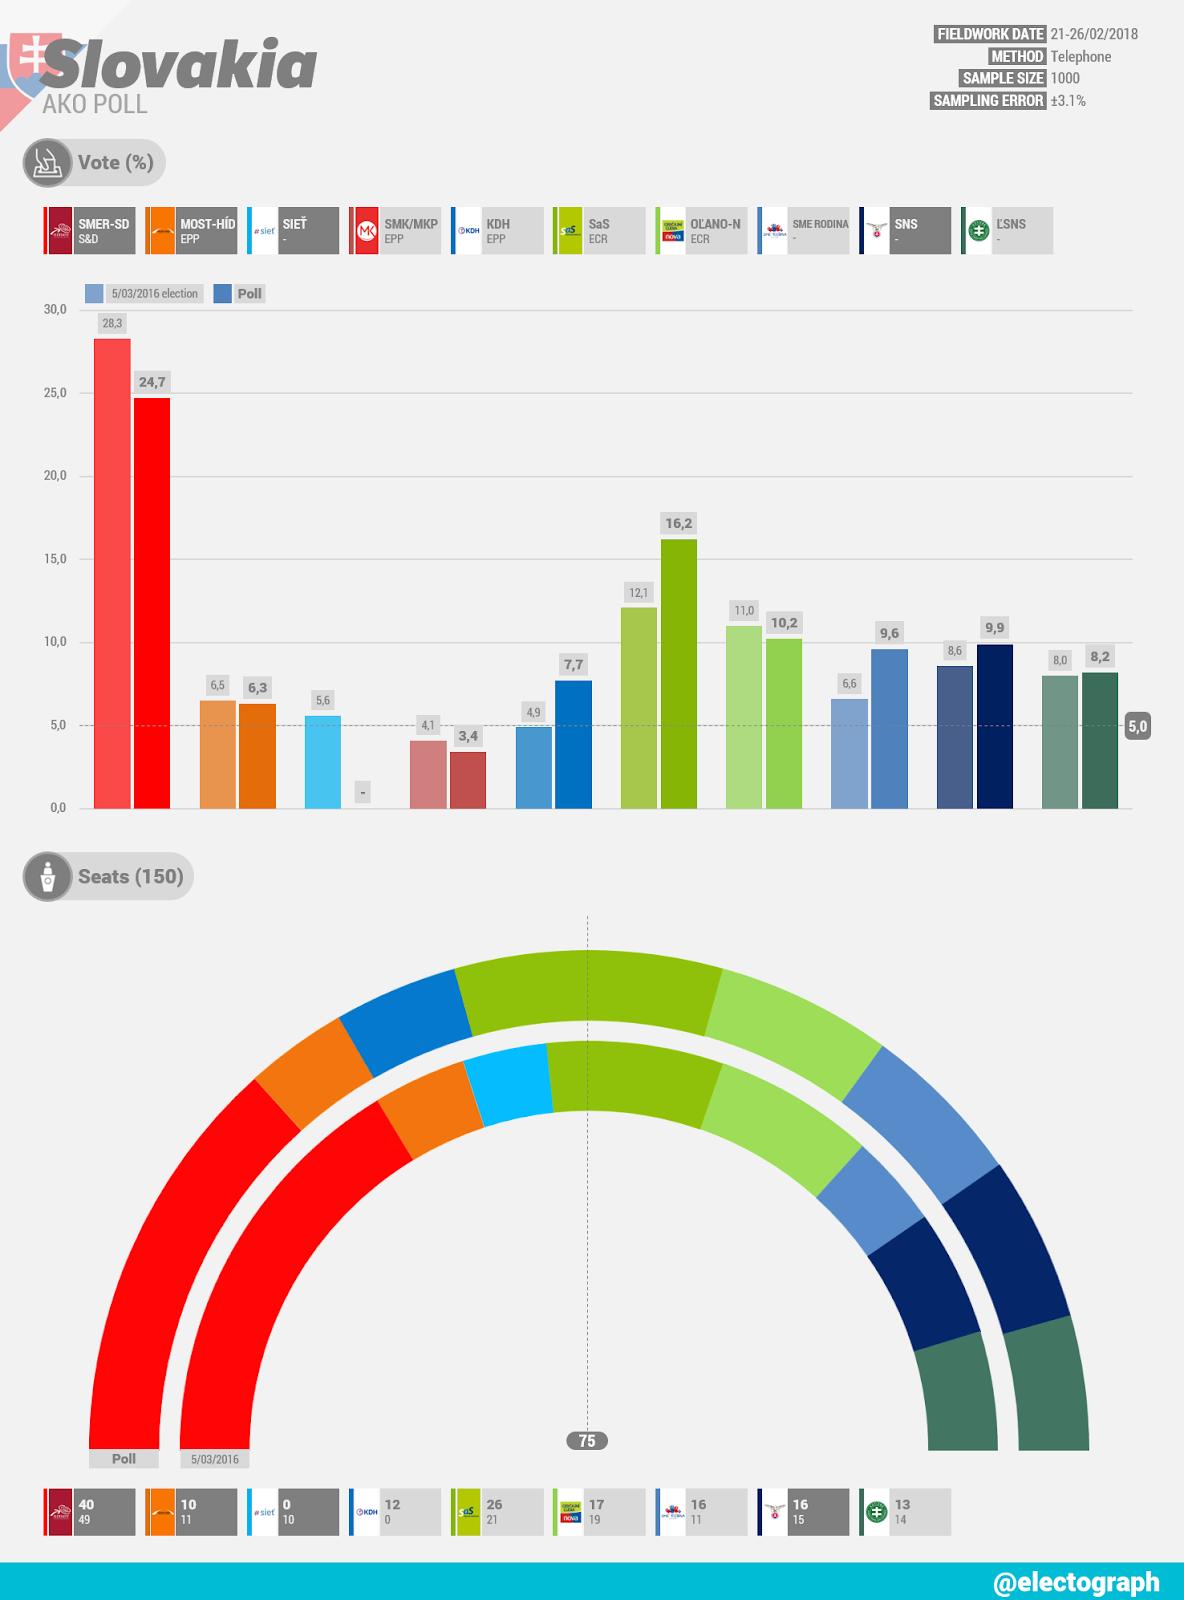 SLOVAKIA AKO poll chart, February 2018